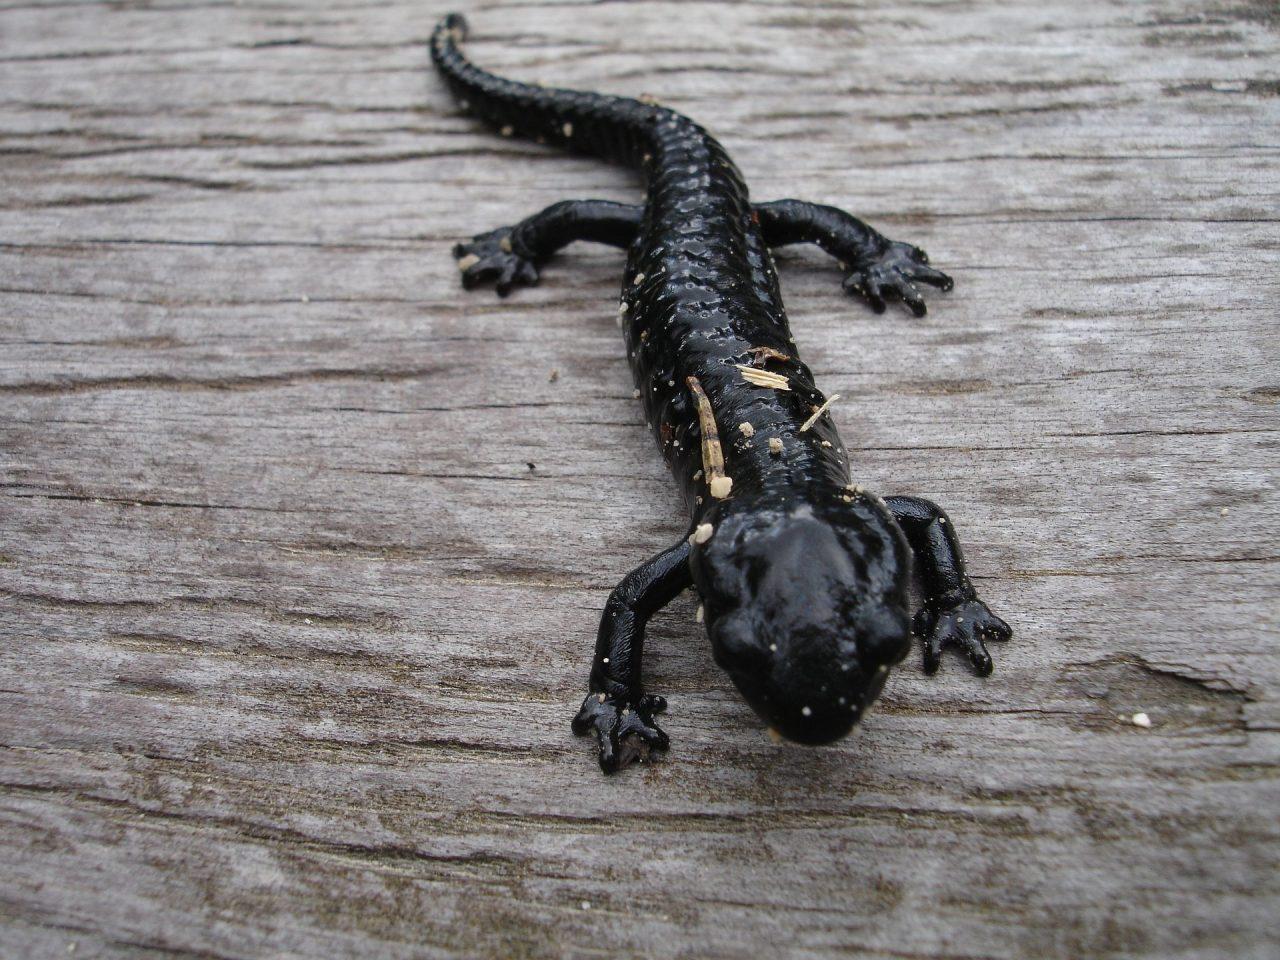 https://educfrance.org/wp-content/uploads/2021/04/salamander-4147_1920-1280x960.jpg